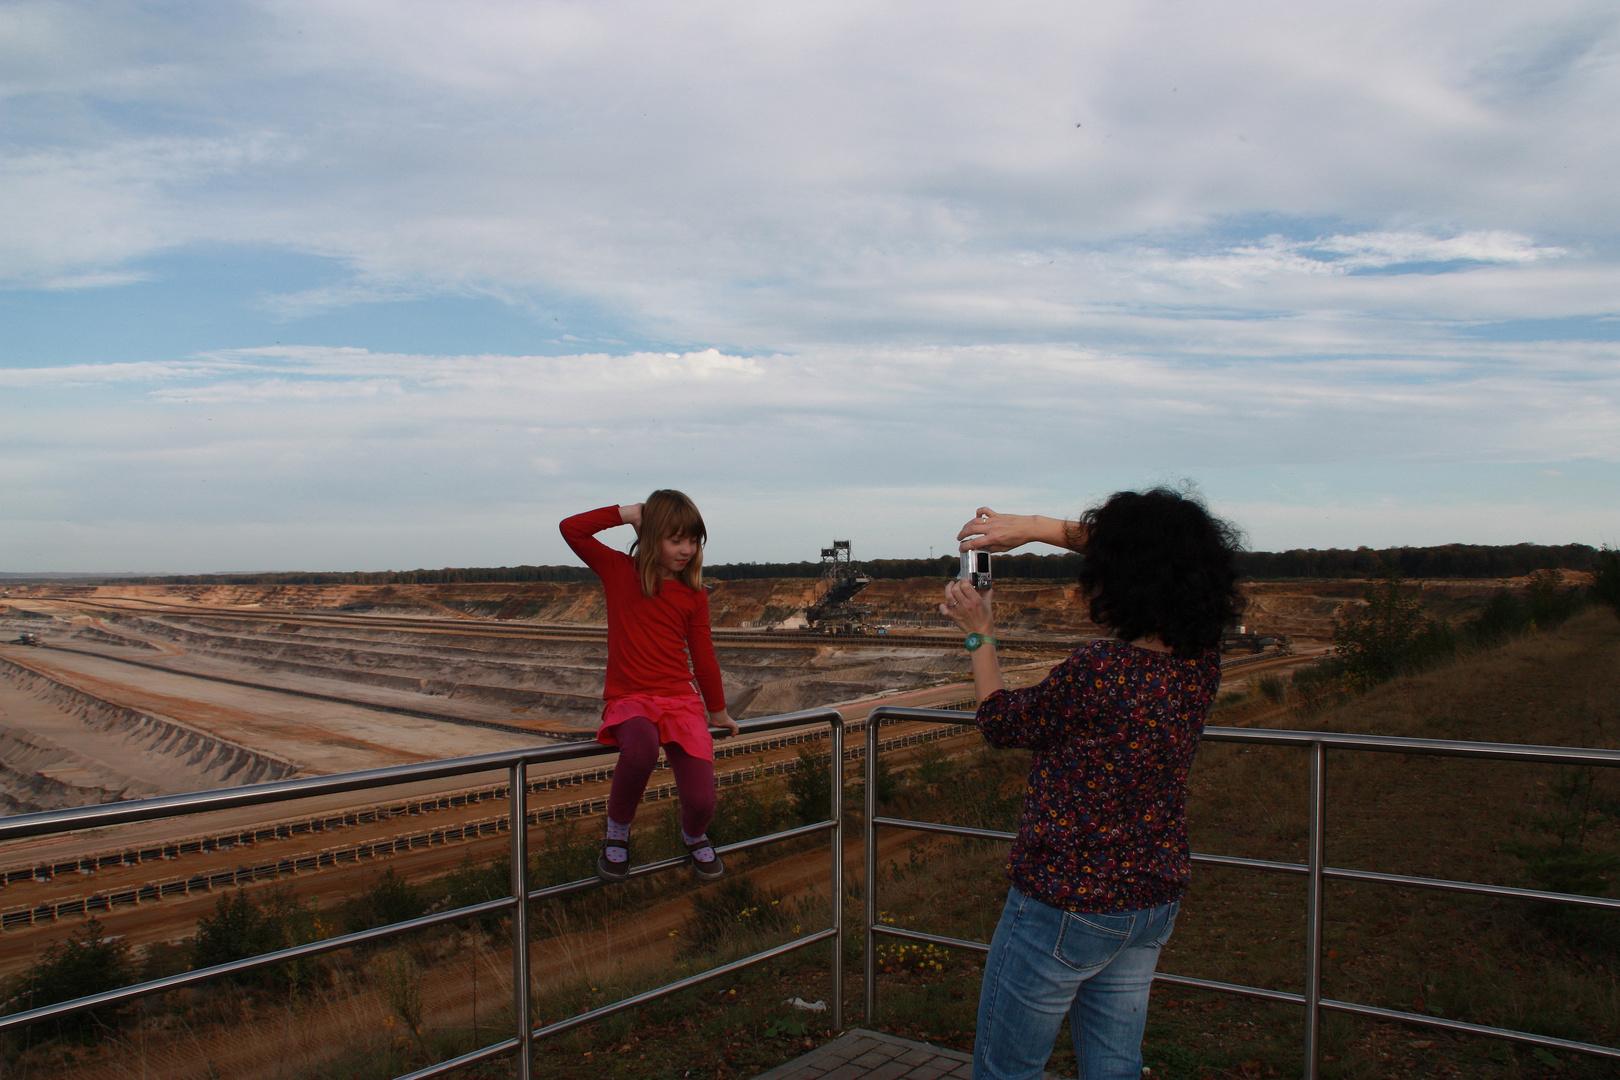 Fotoshooting im Tagebau